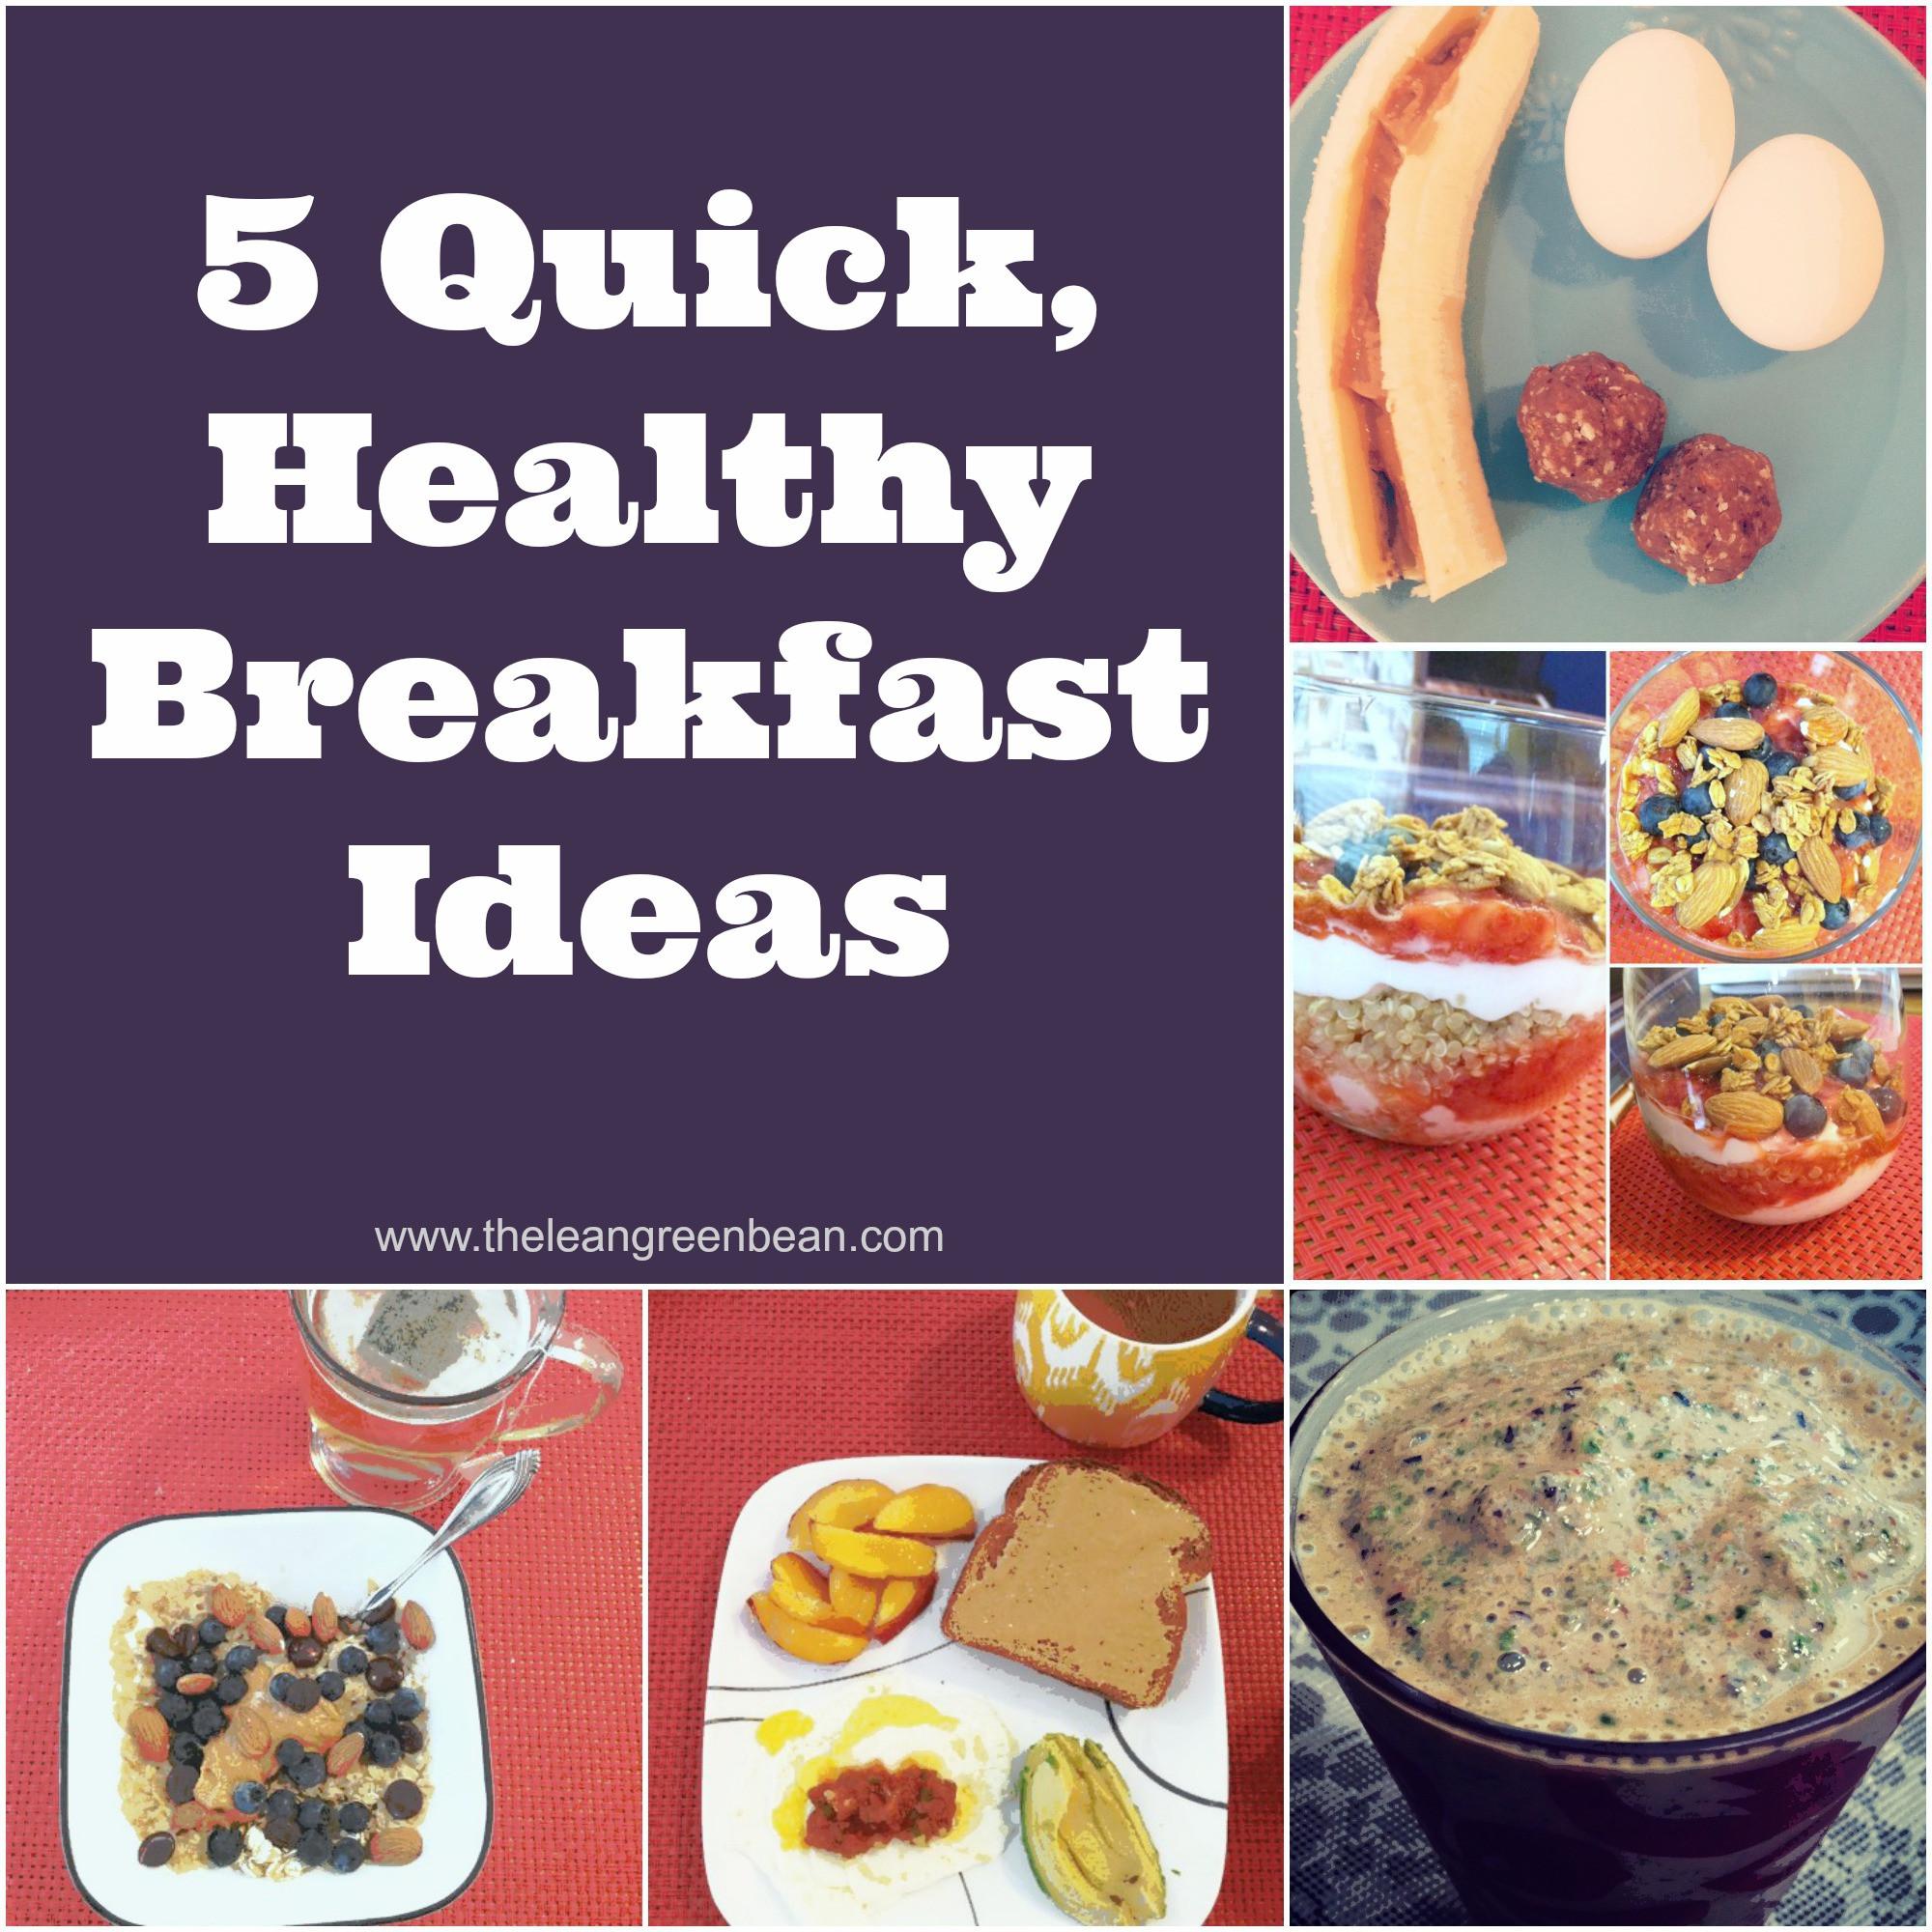 Healthy Easy Breakfast  5 Quick Healthy Breakfast Ideas from a Registered Dietitian